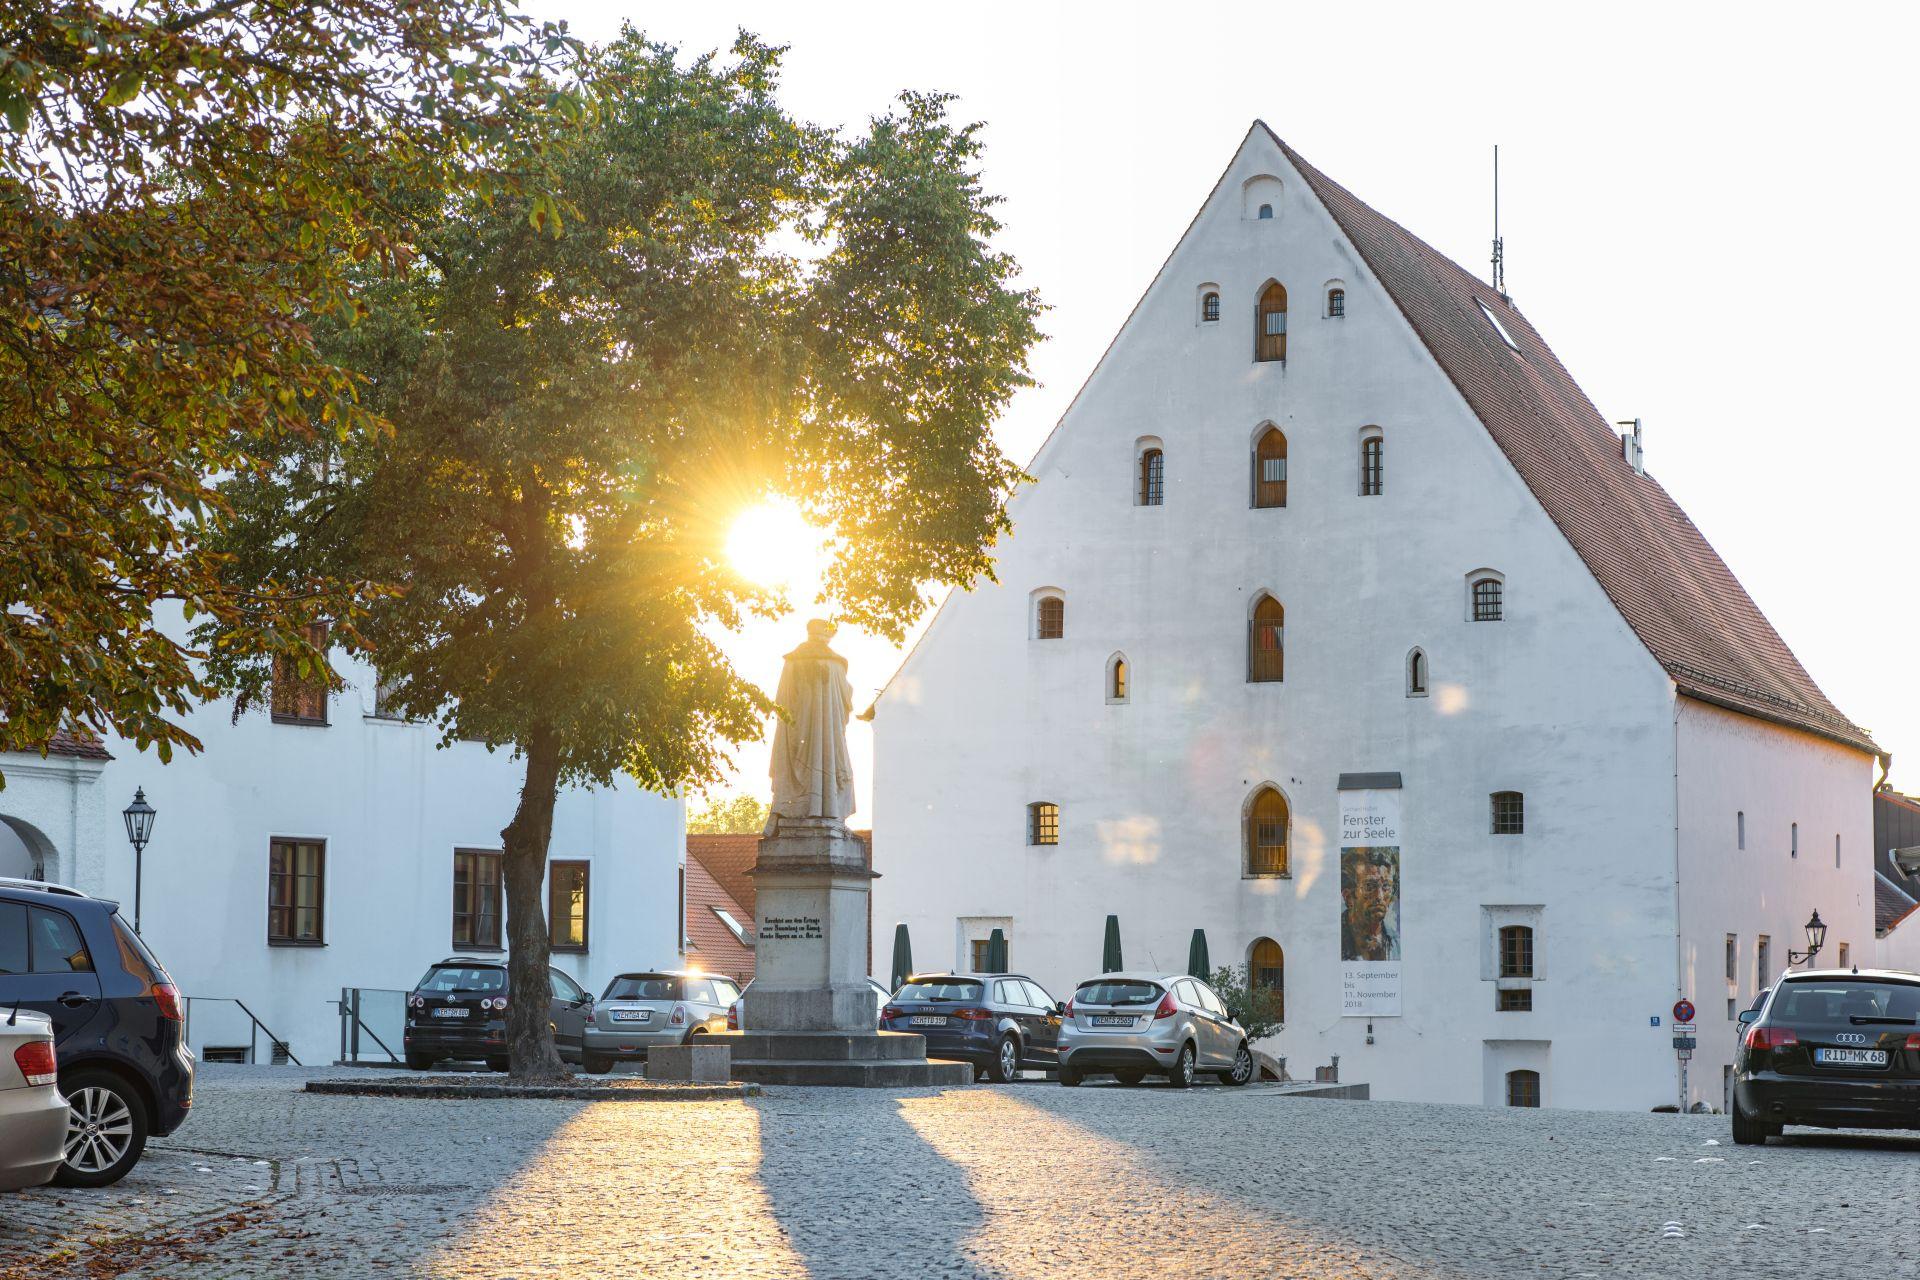 Stadtmuseum im Herzogskasten in Abensberg